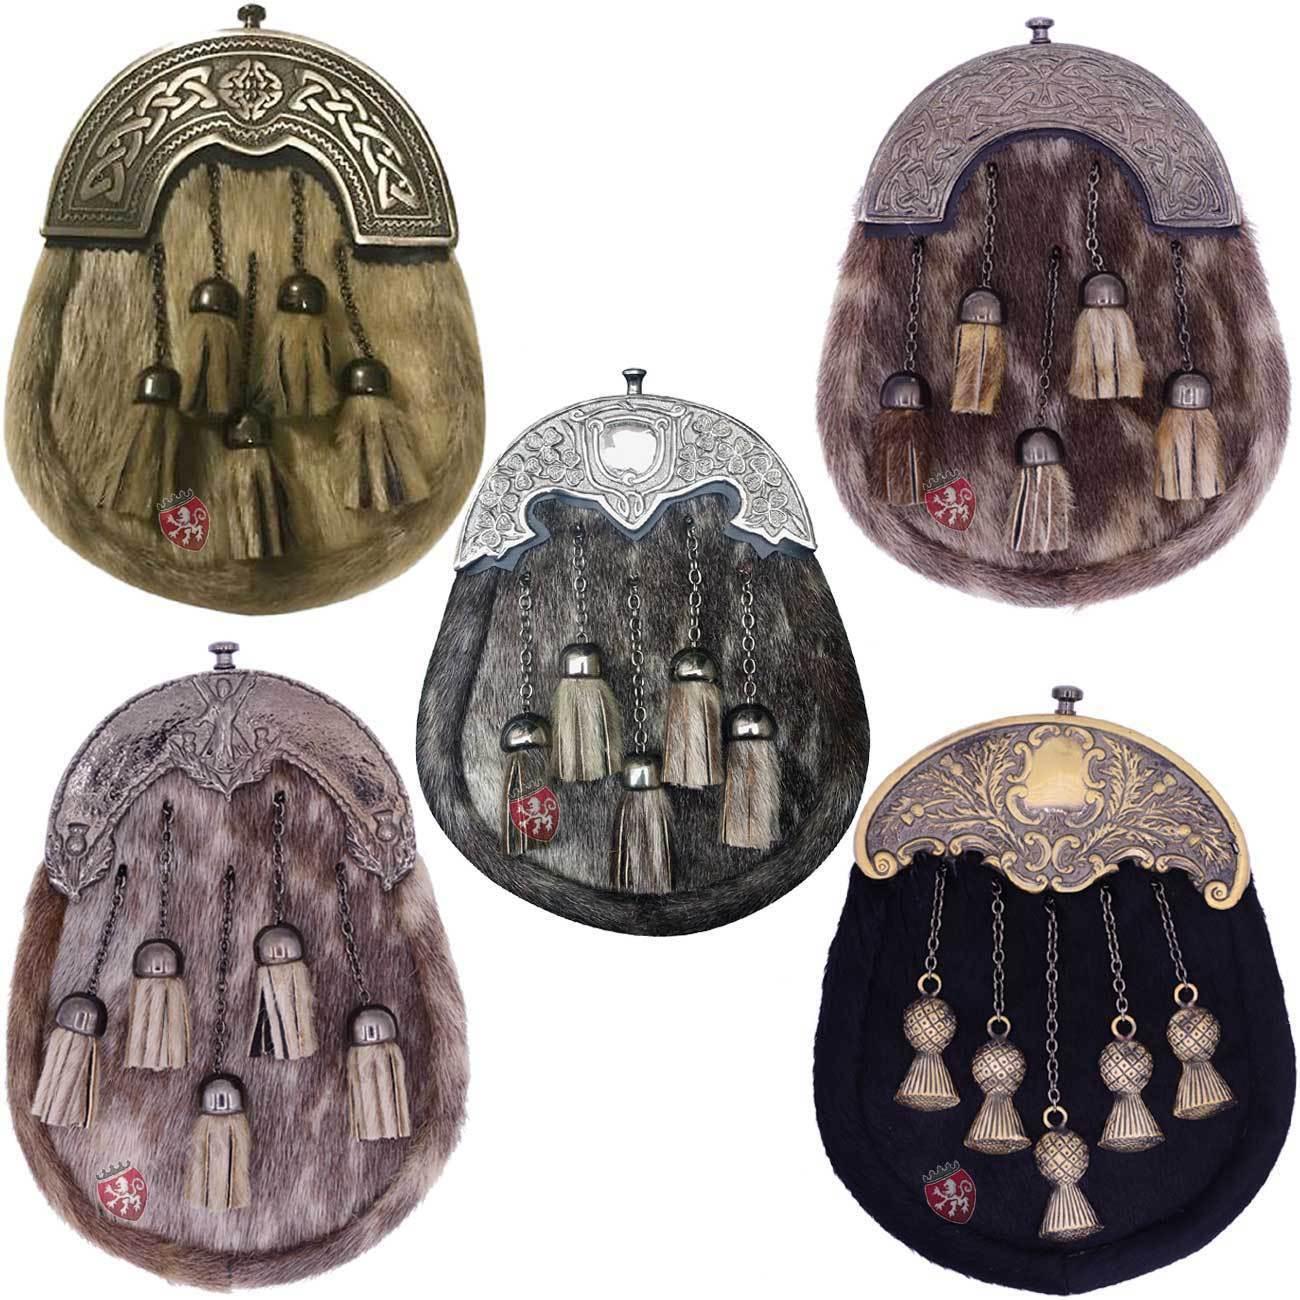 Men's Dress Kilt Sporran Formal Seal Skin Celtic Cantle Antique Various Design